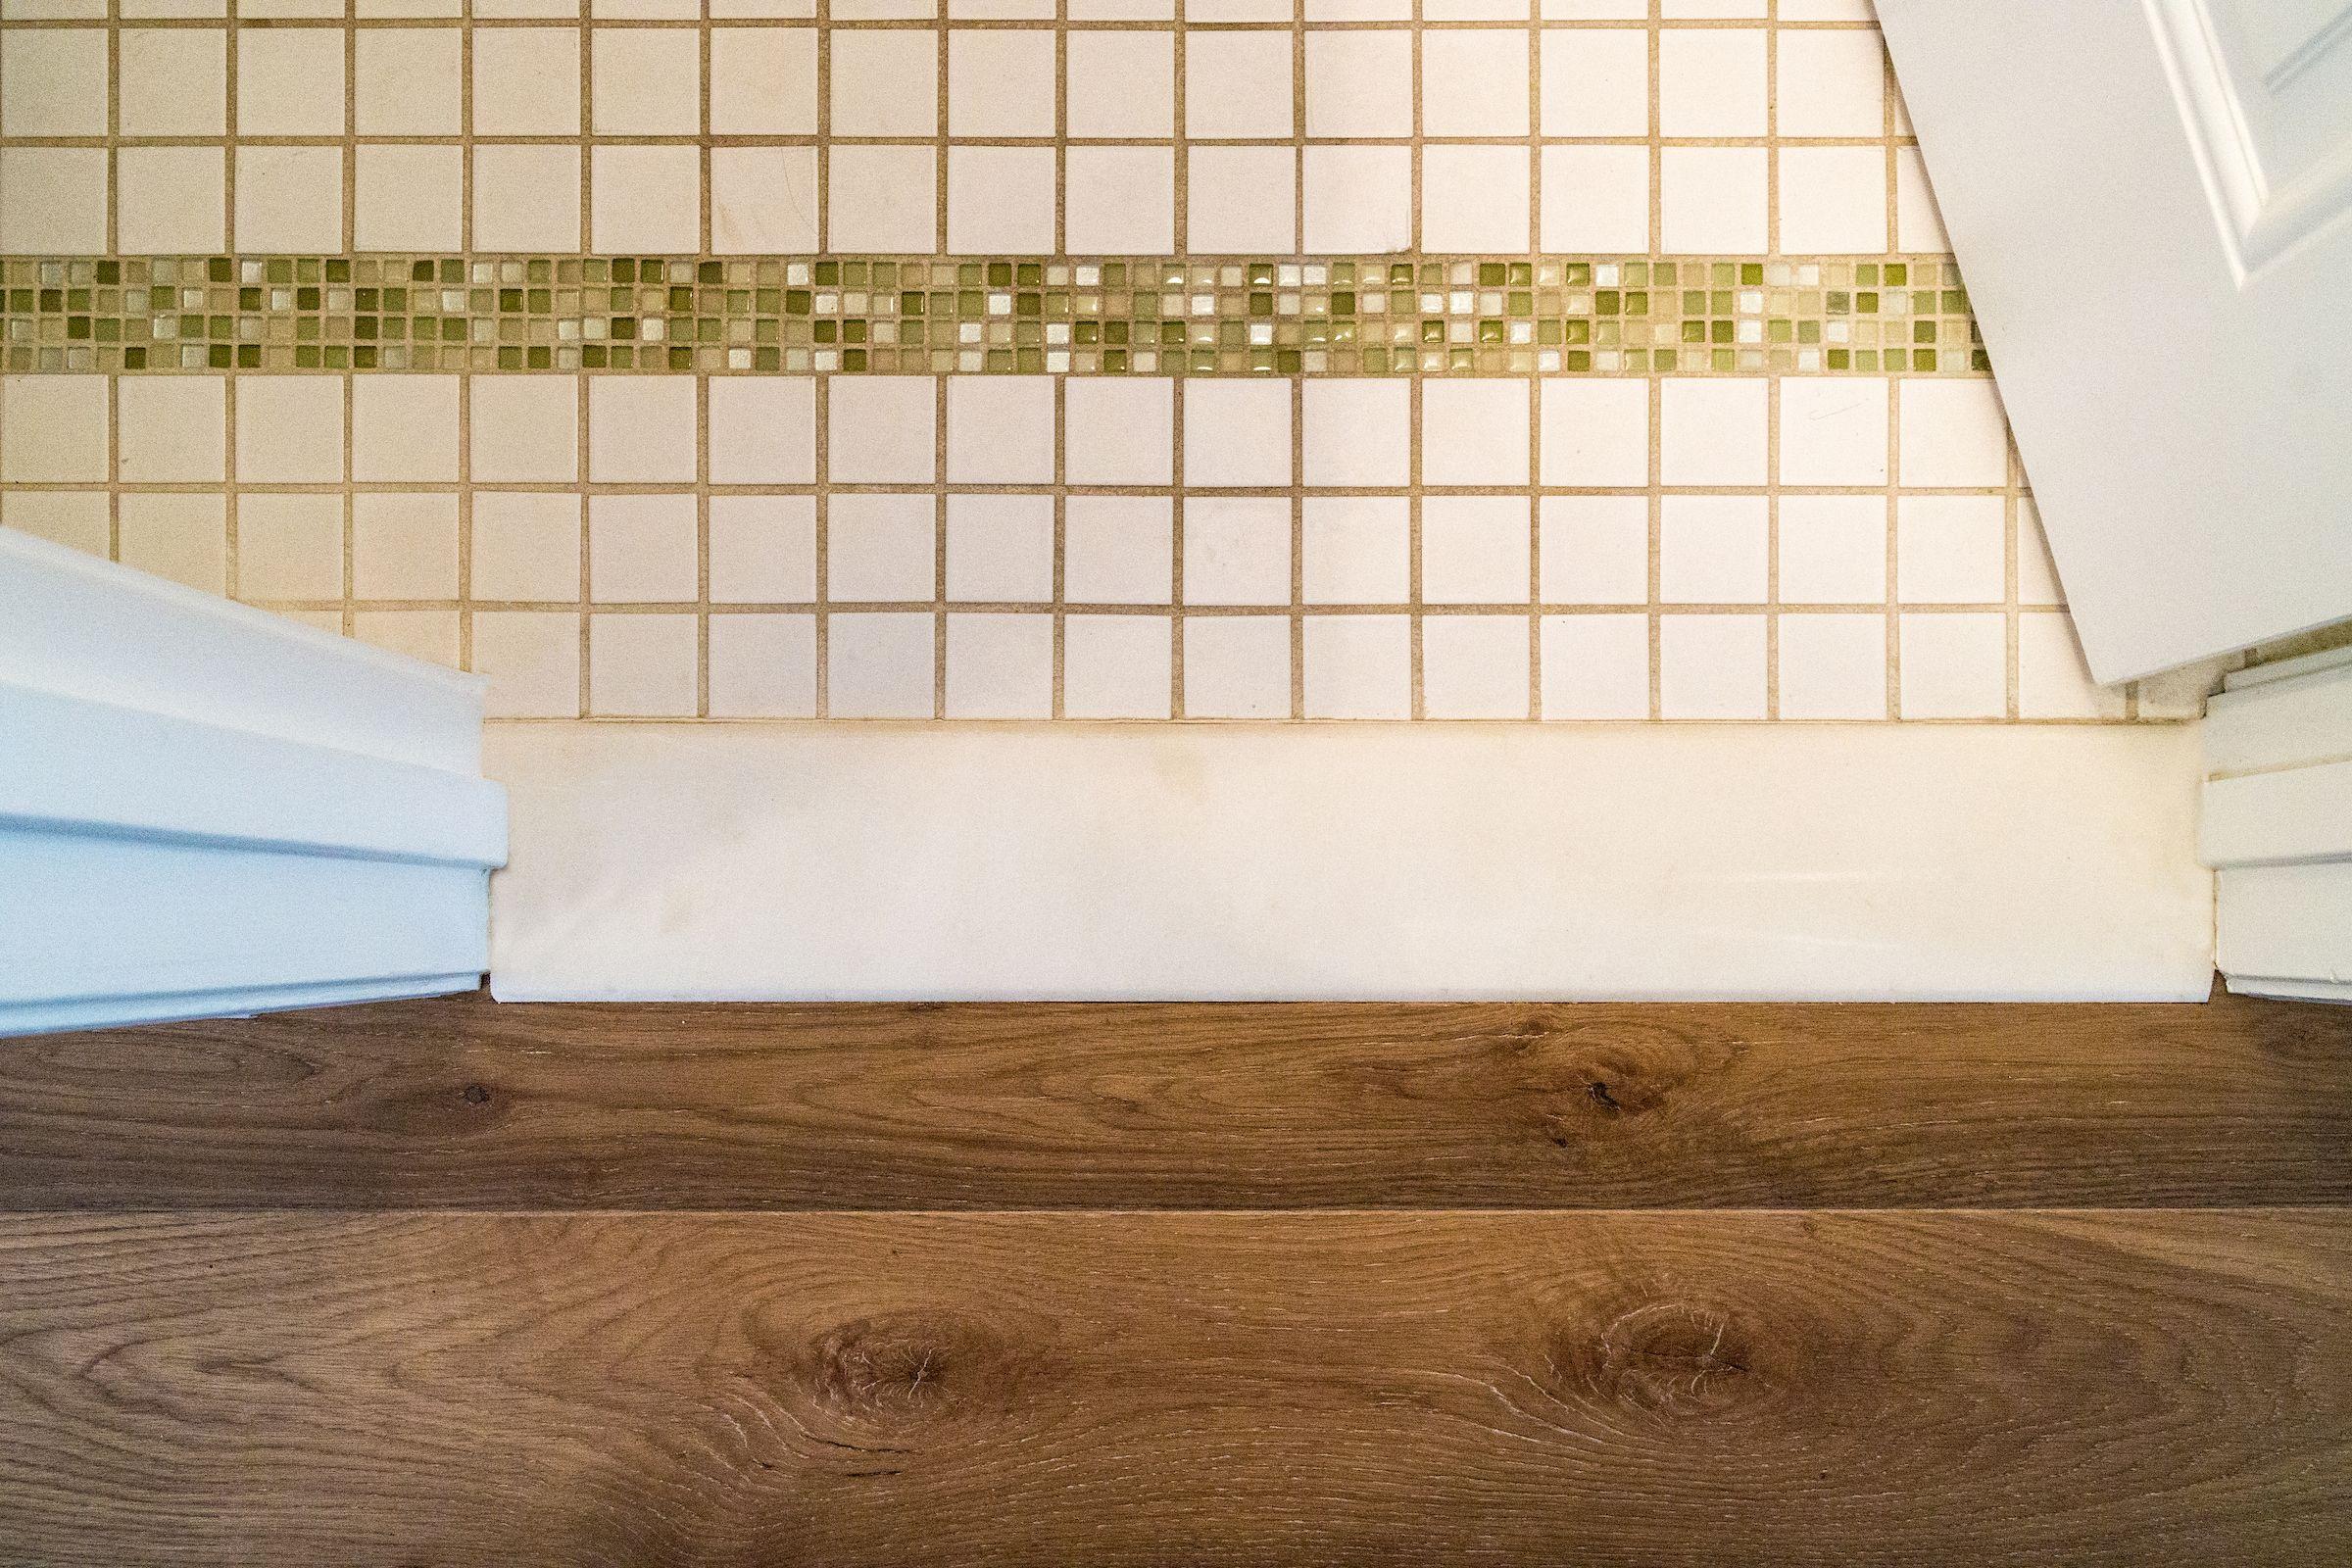 Lake house hardwood flooring nautical wide plank white oak hardwood flooring transitions to bathroom tile